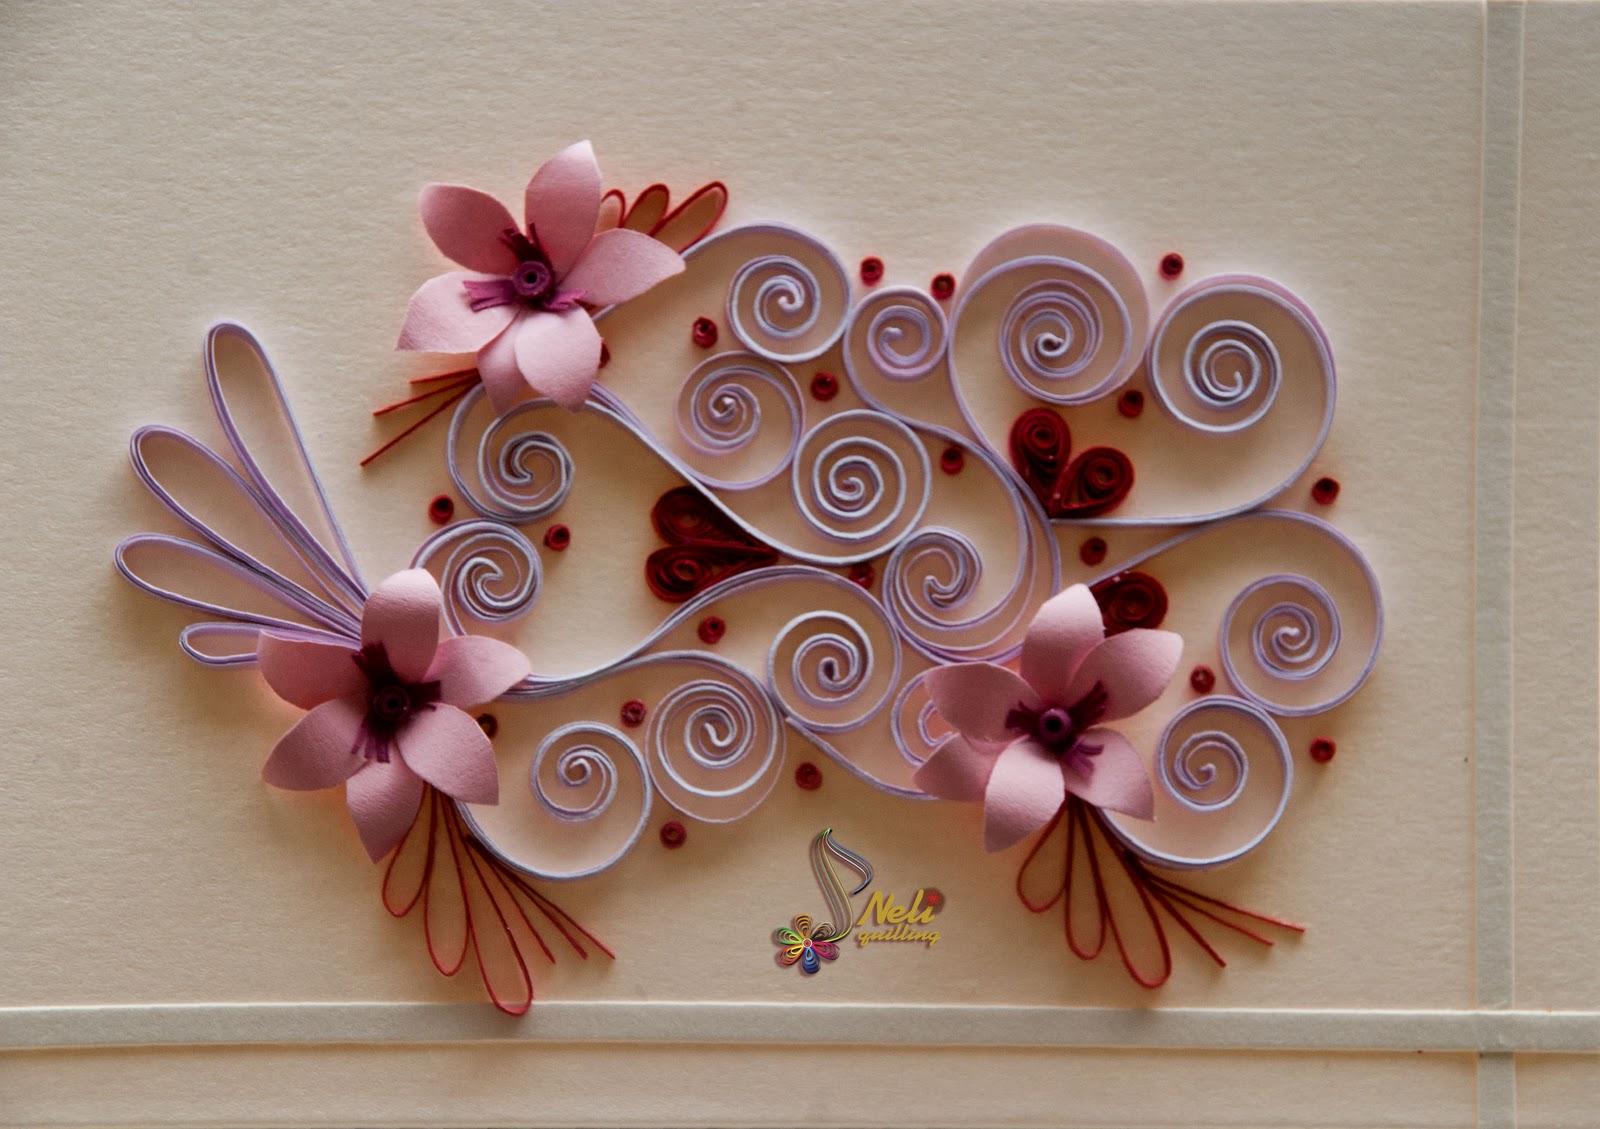 Loja Artesanato Osasco Primitiva Vianco ~ Neli Quilling Art Quilling cards With love  2